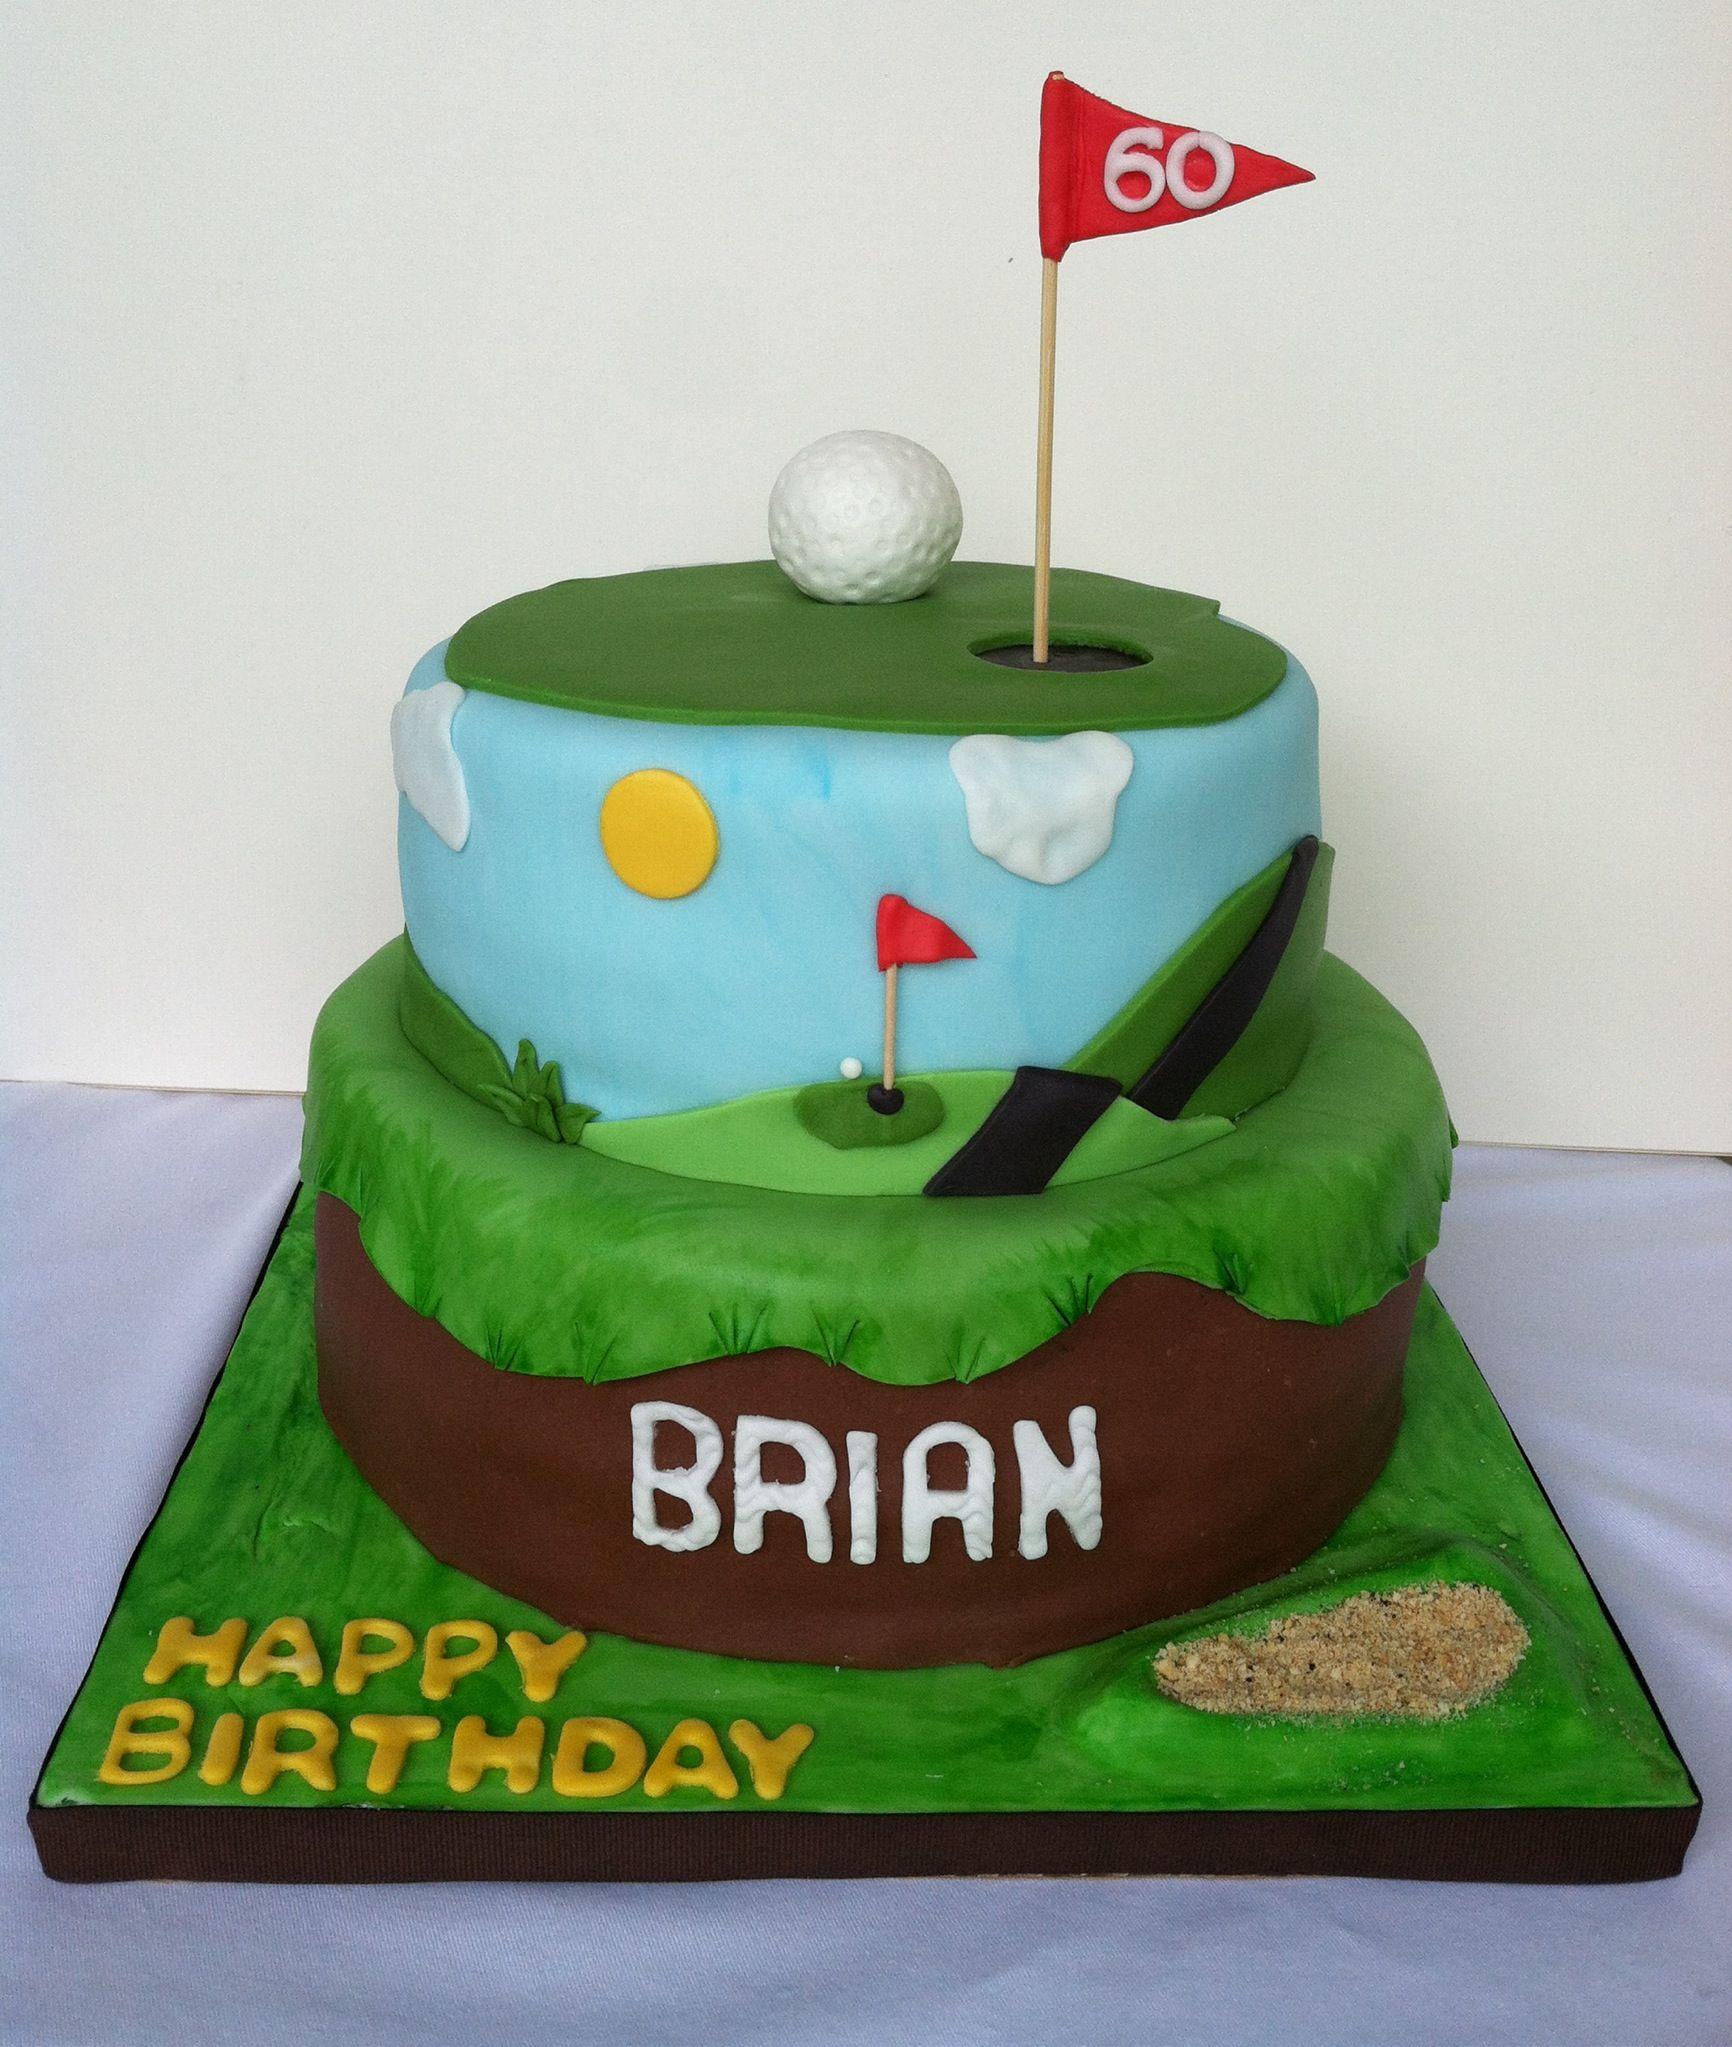 Happy 60th Birthday Golf Theme Chocolate Cake